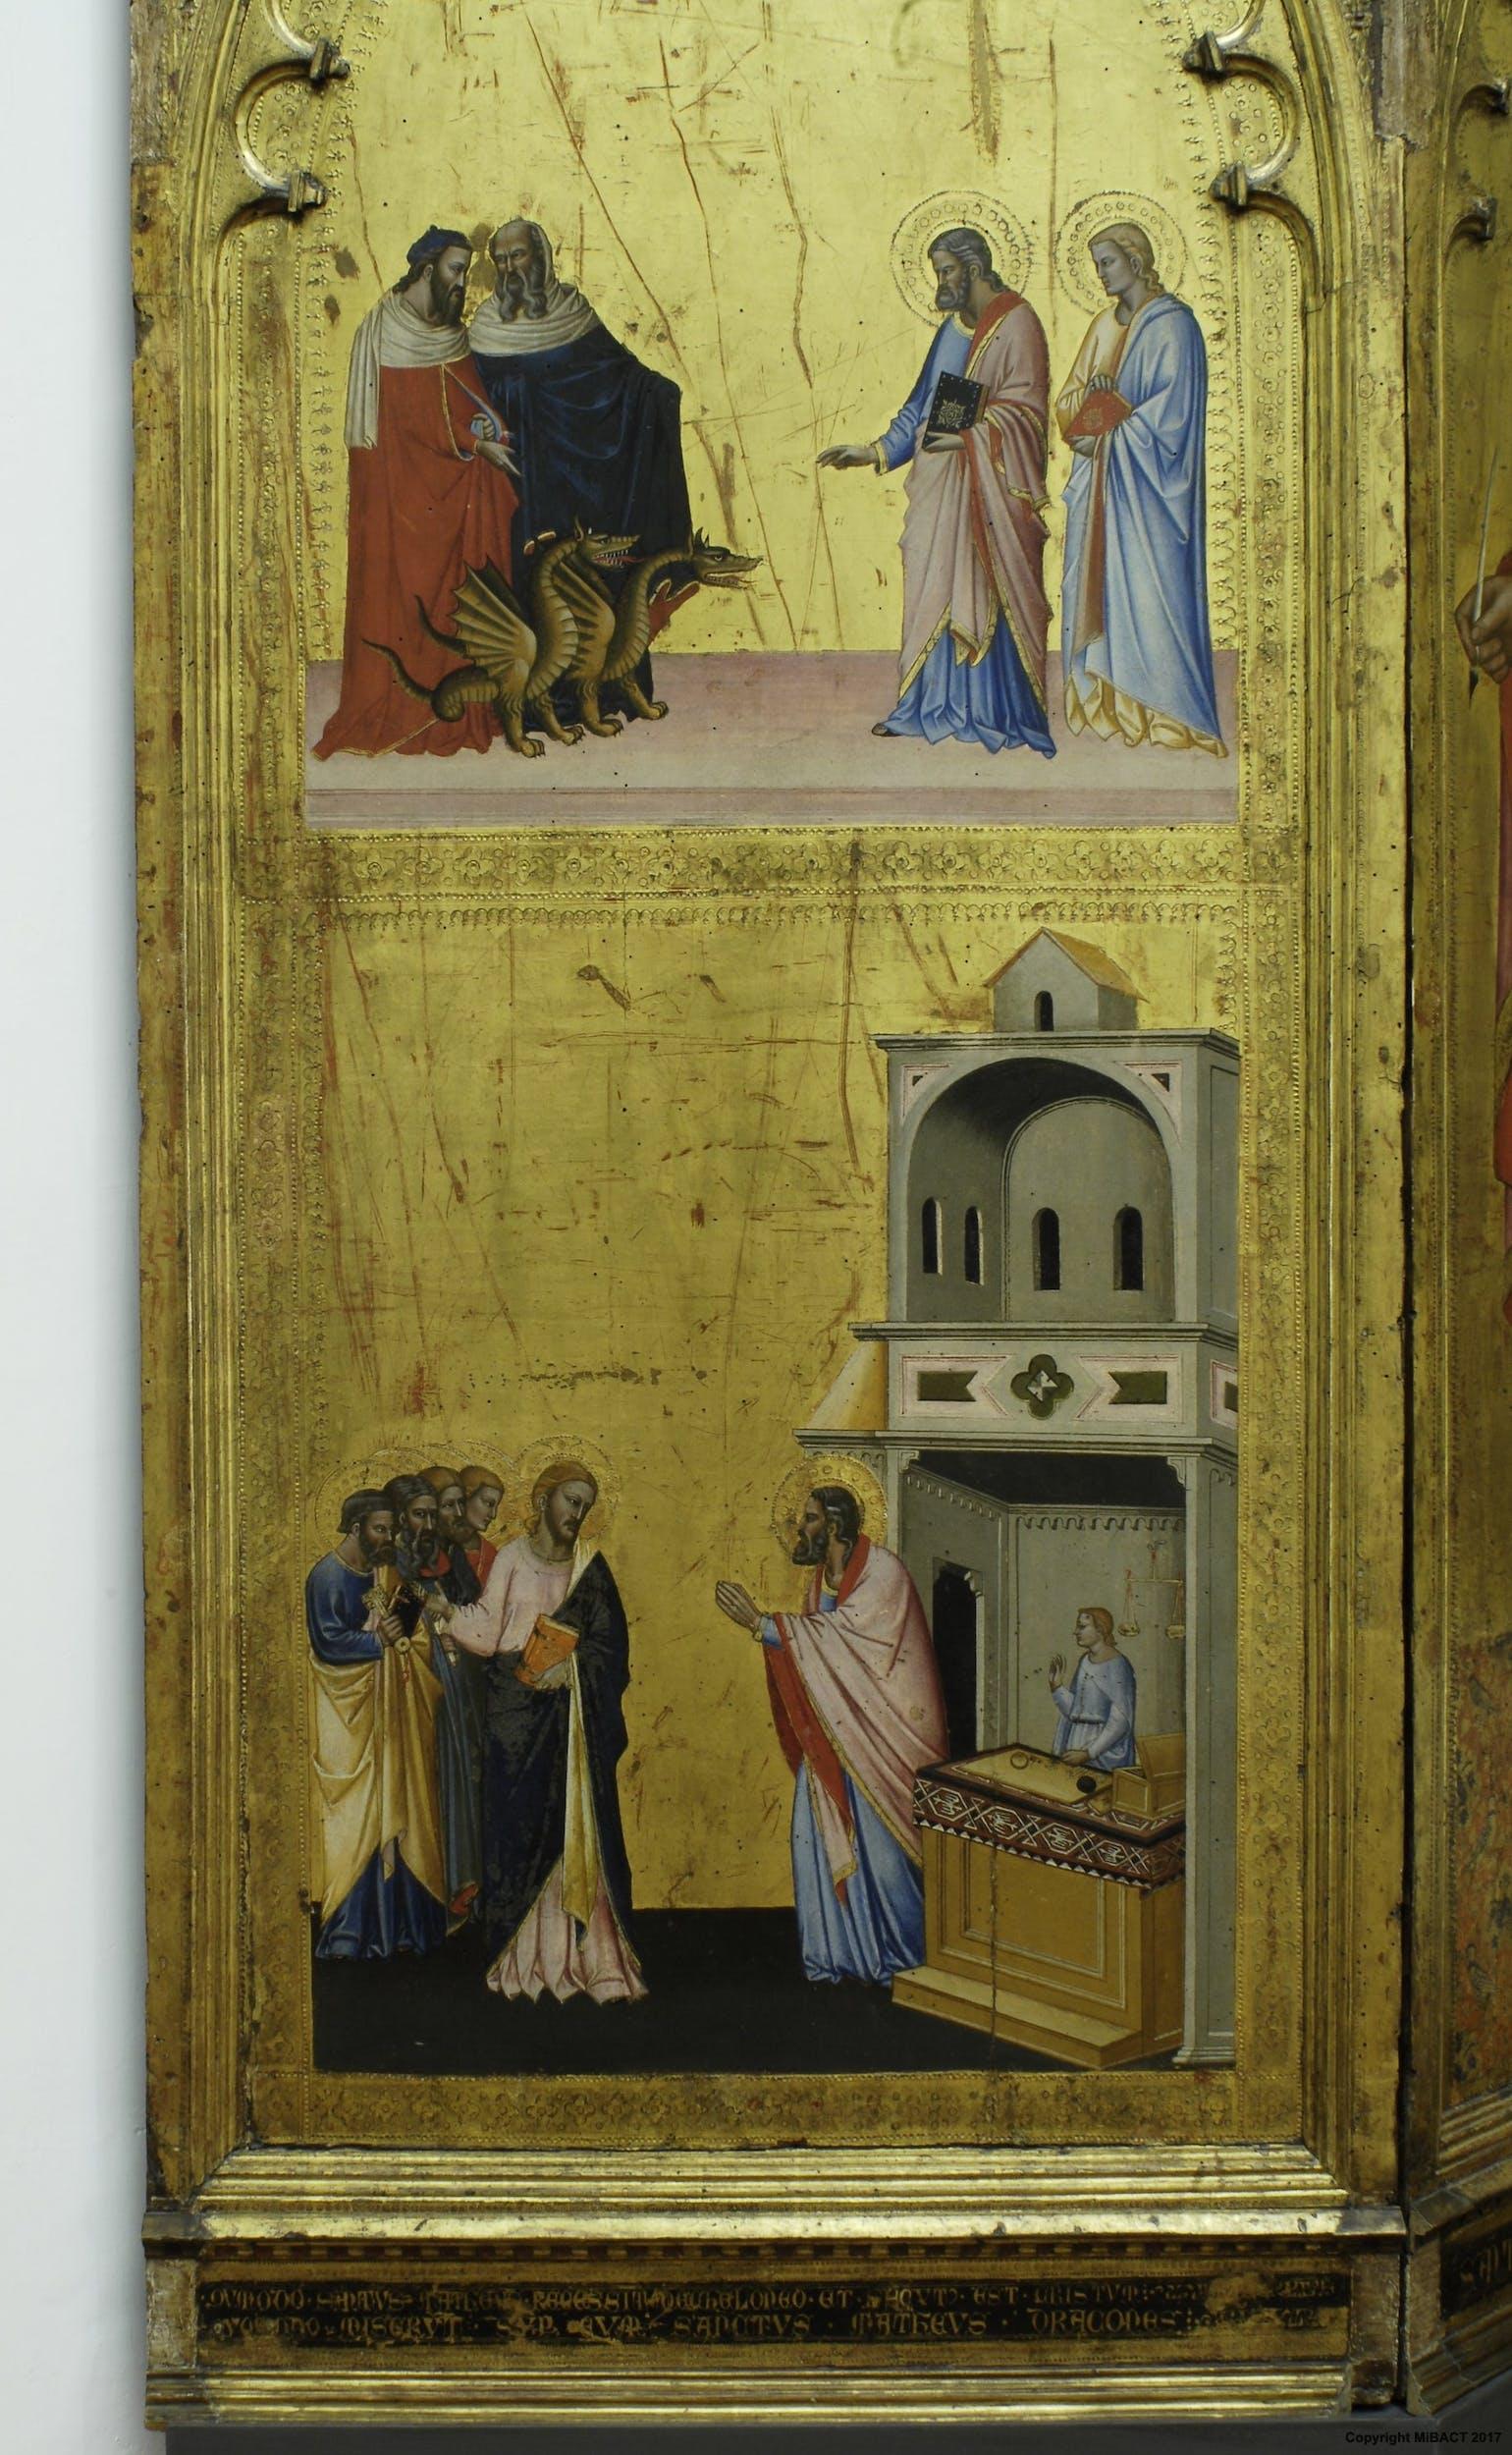 San Matteo ammansisce i due draghi di Vadabar;Vocazione di san Matteo | St Matthew tames the two dragons of Vadabar;Vocation of St Matthew